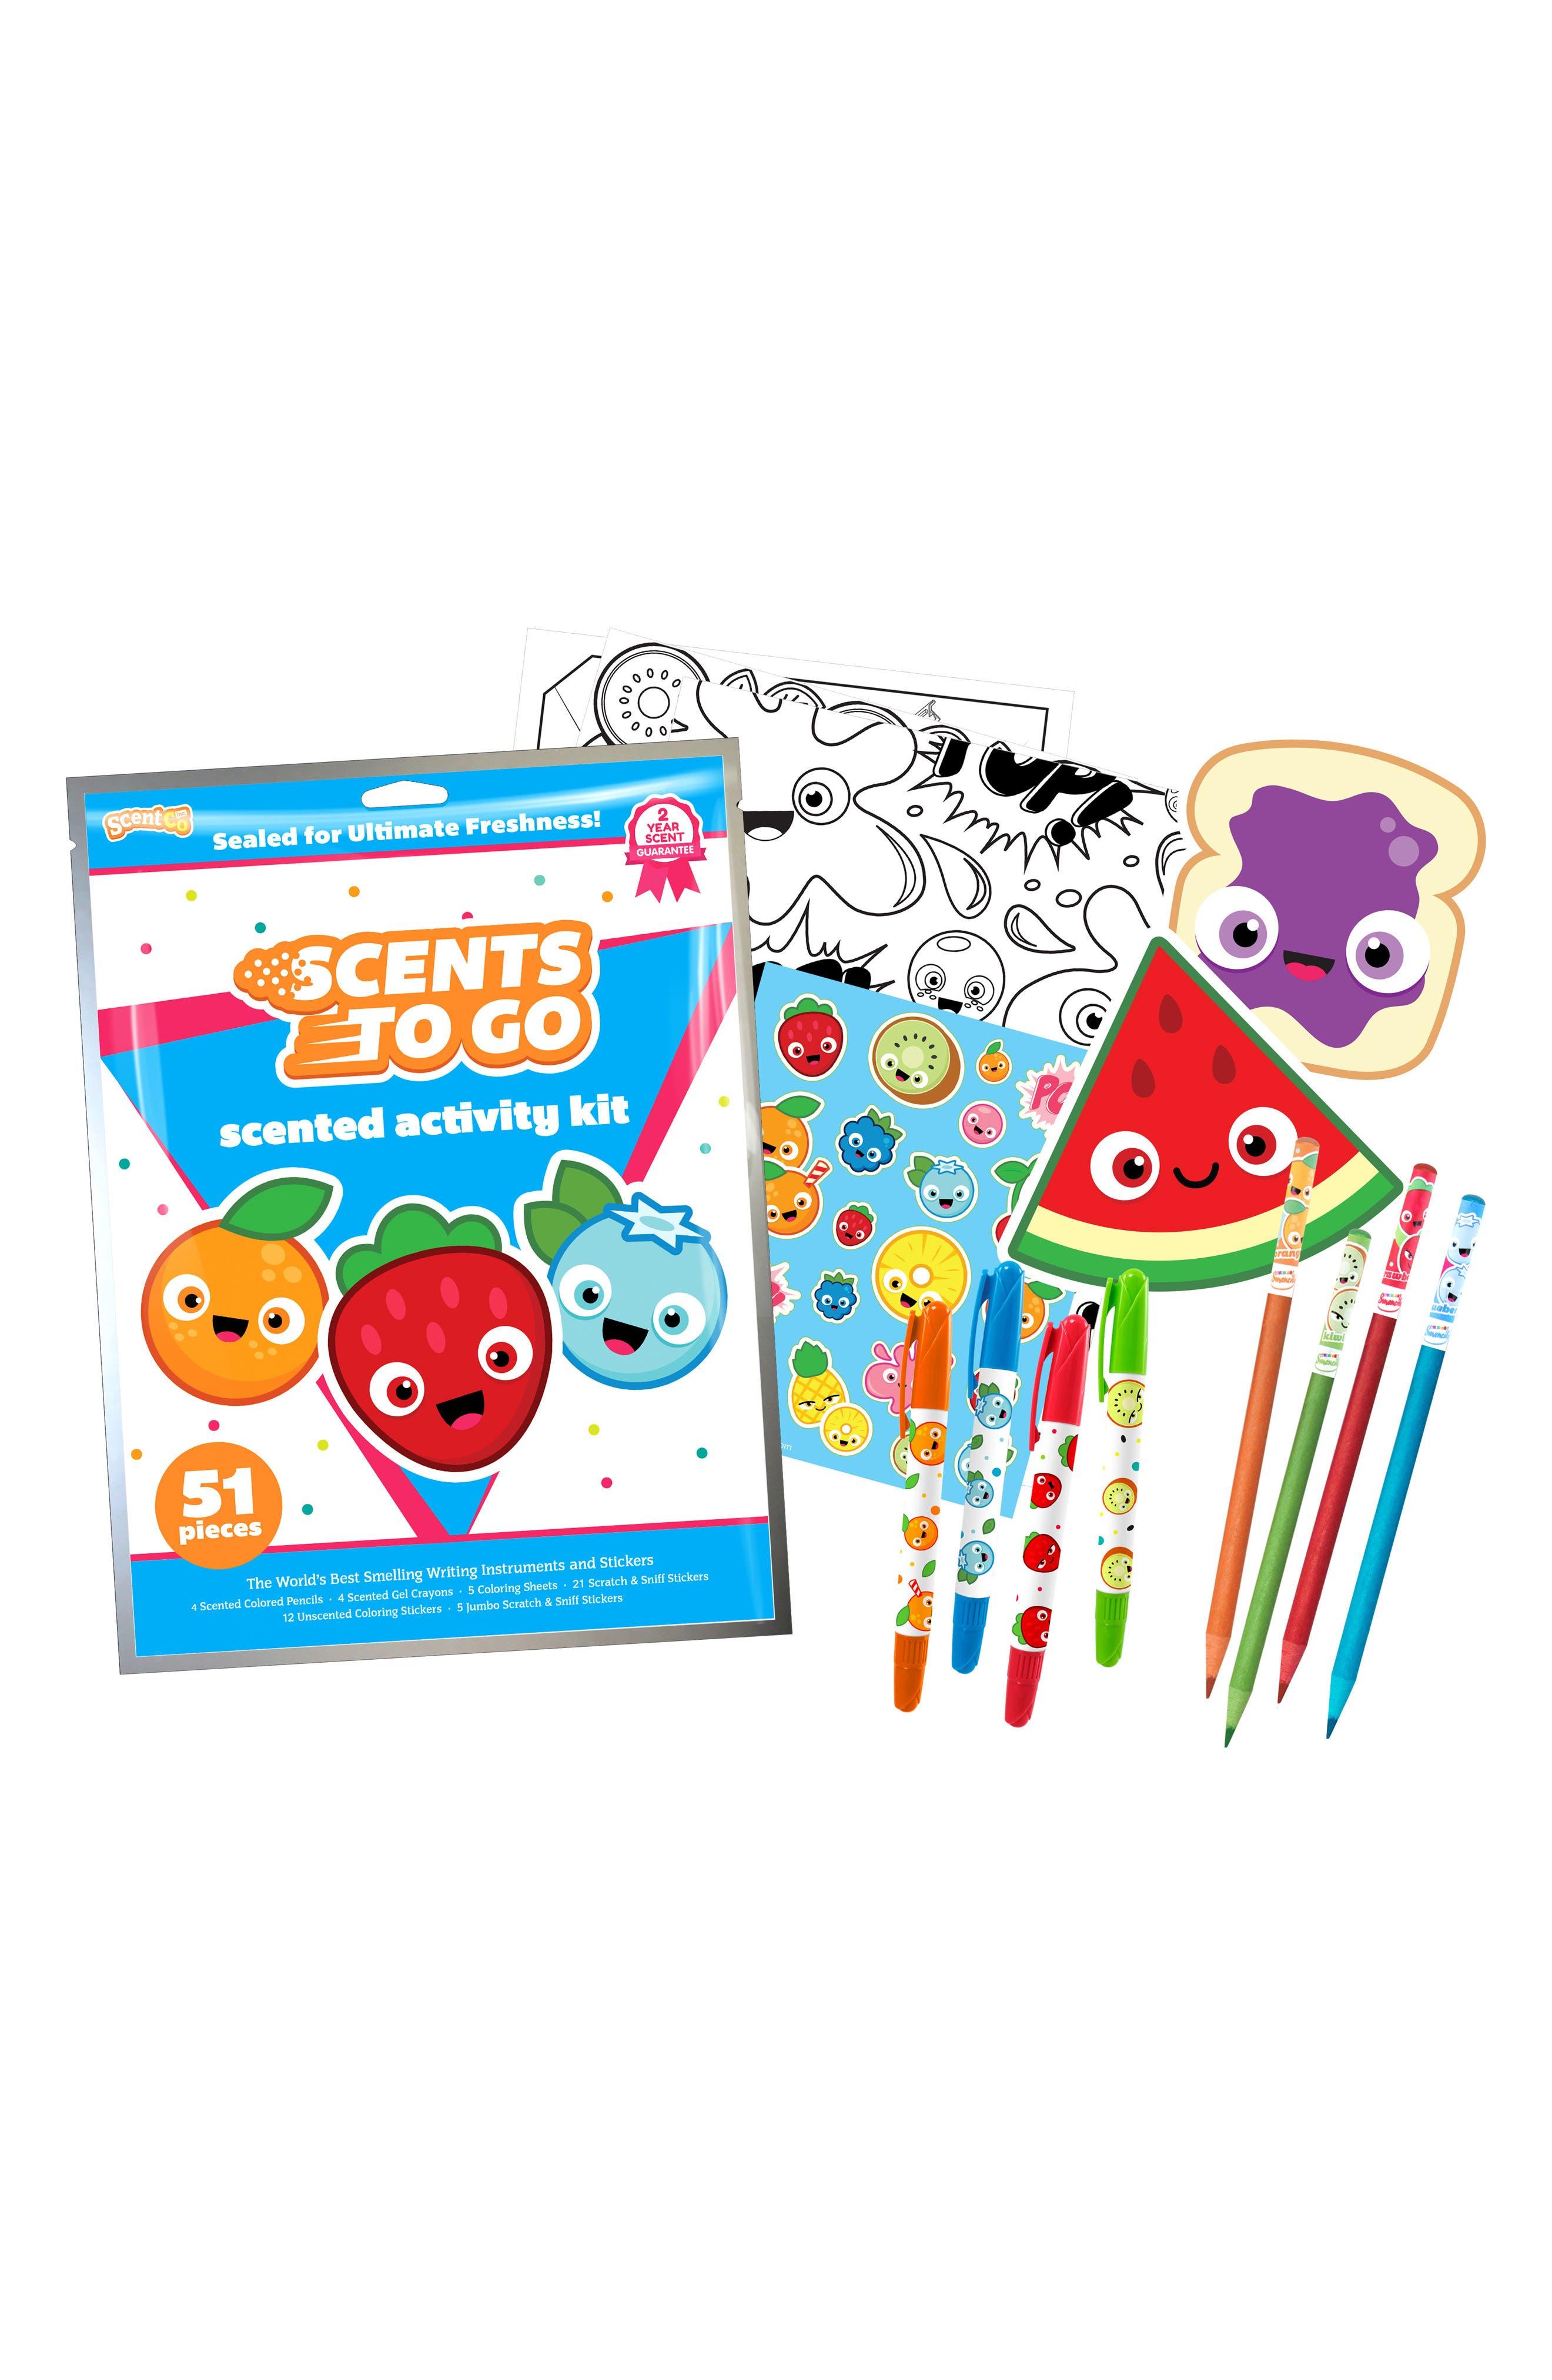 Scentco Scents to Go 51-Piece Activity Kit